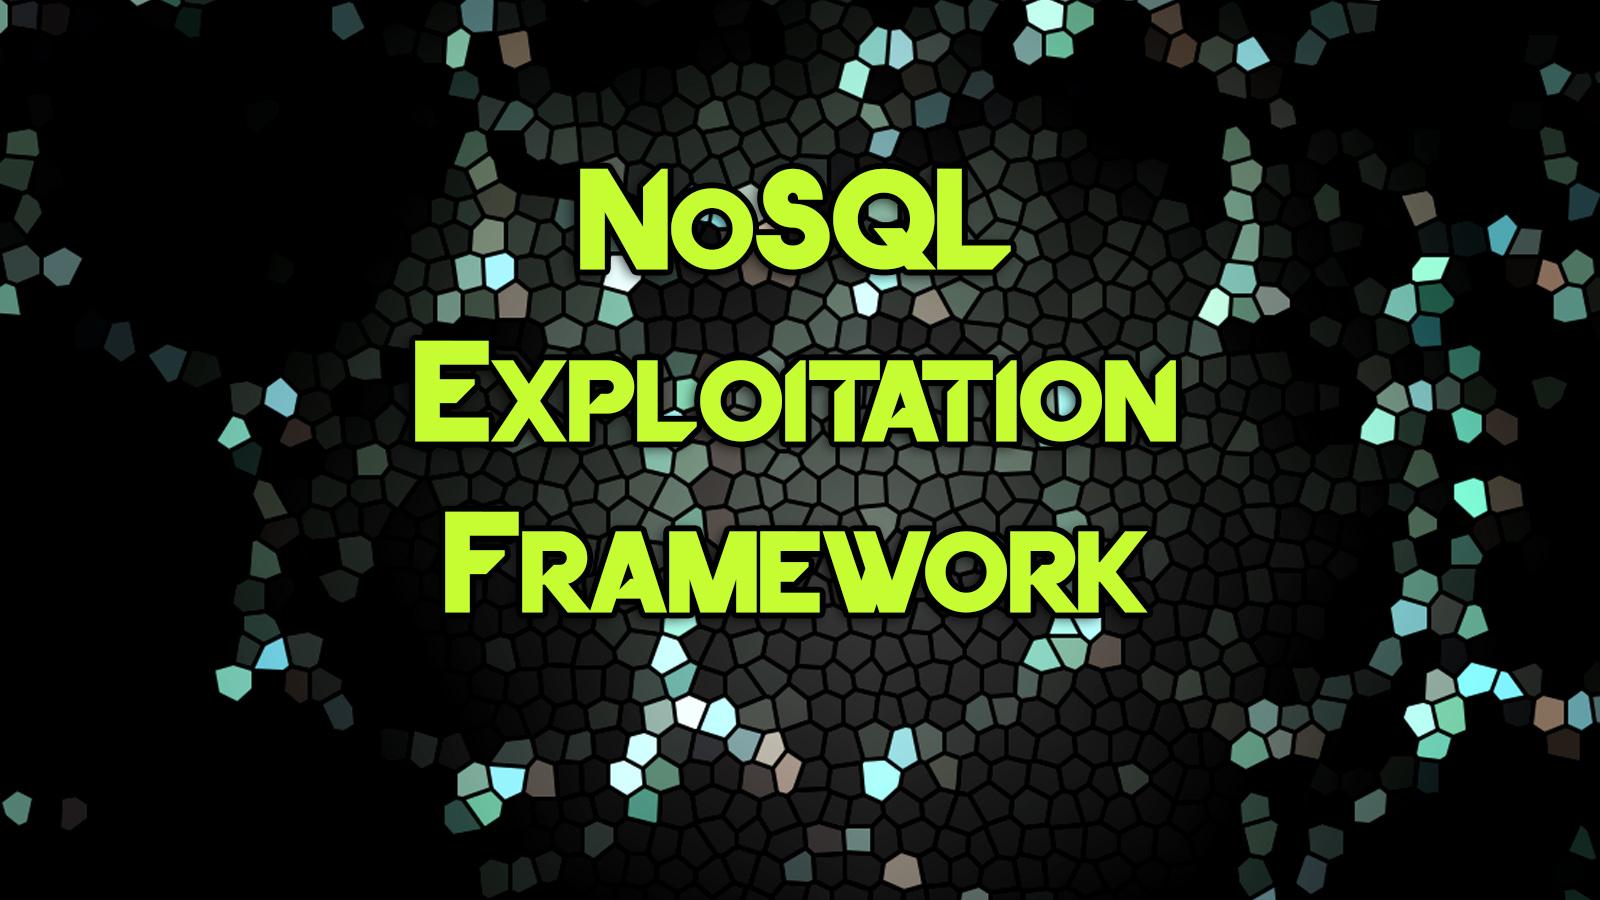 NoSQL Exploitation Framework - A Python Framework for NoSQL Scanning and Exploitation